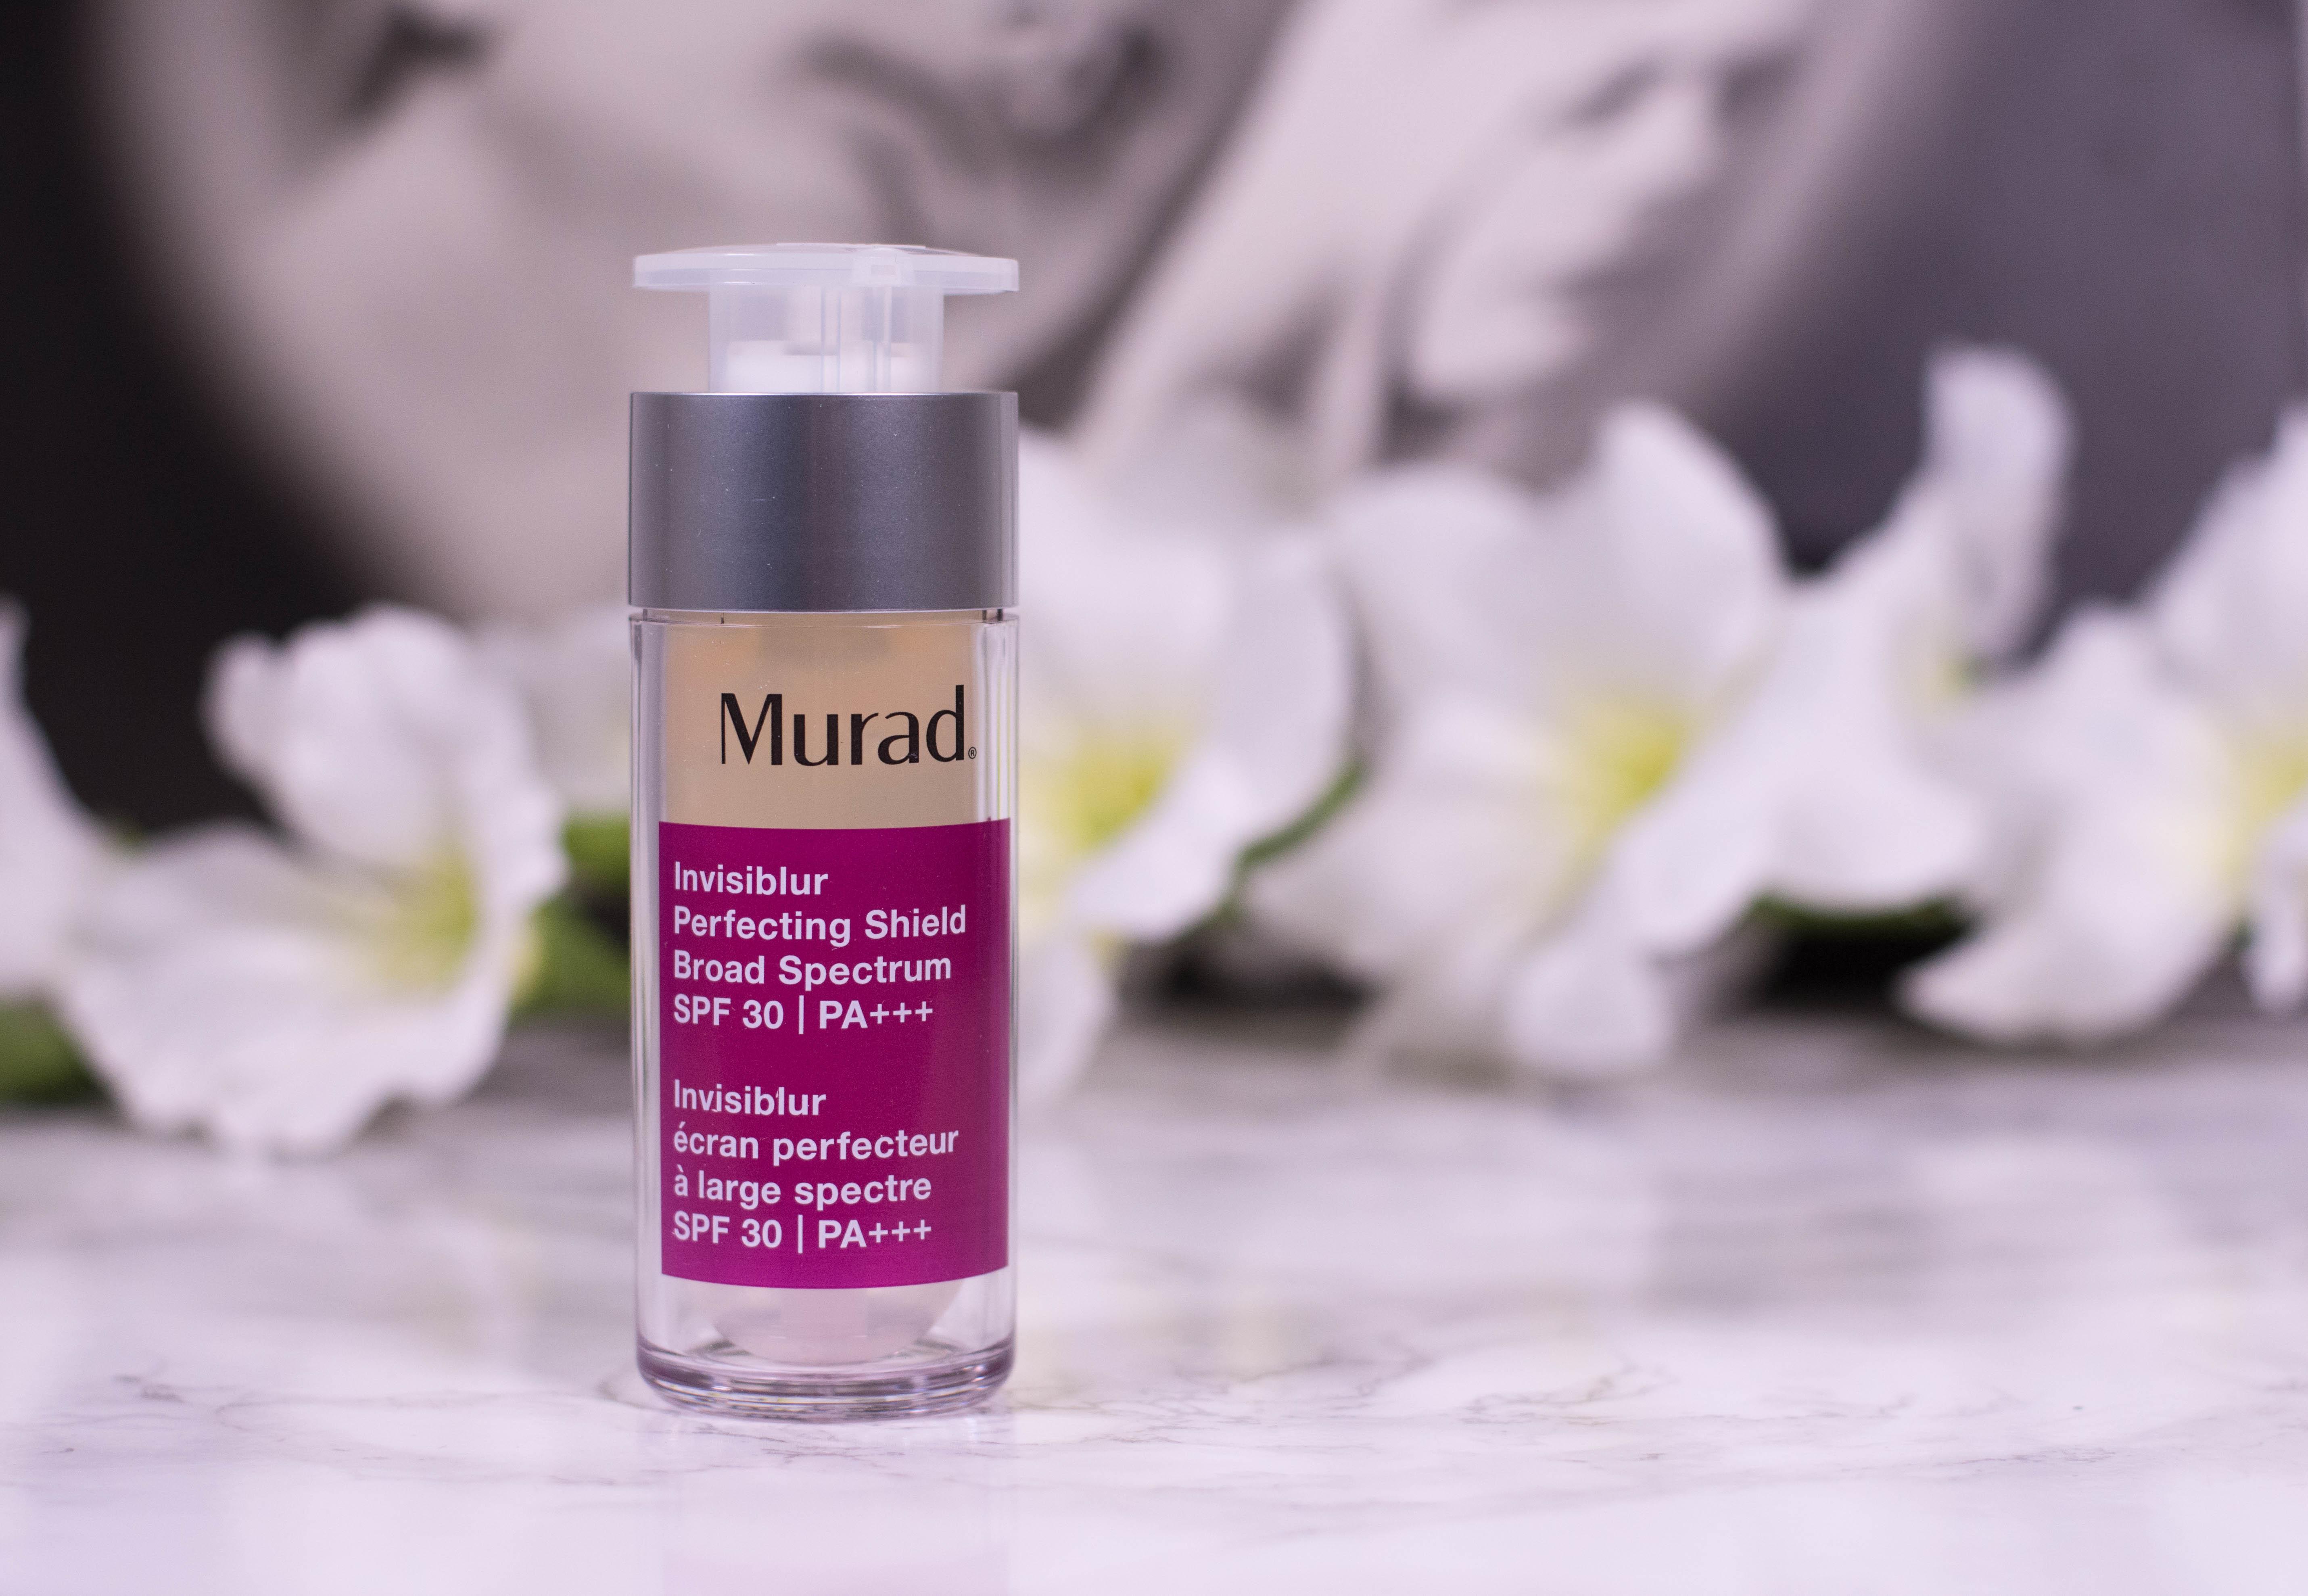 Murad Invisiblur Perfecting Shield Broad Spectrum SPF 30/PA+++